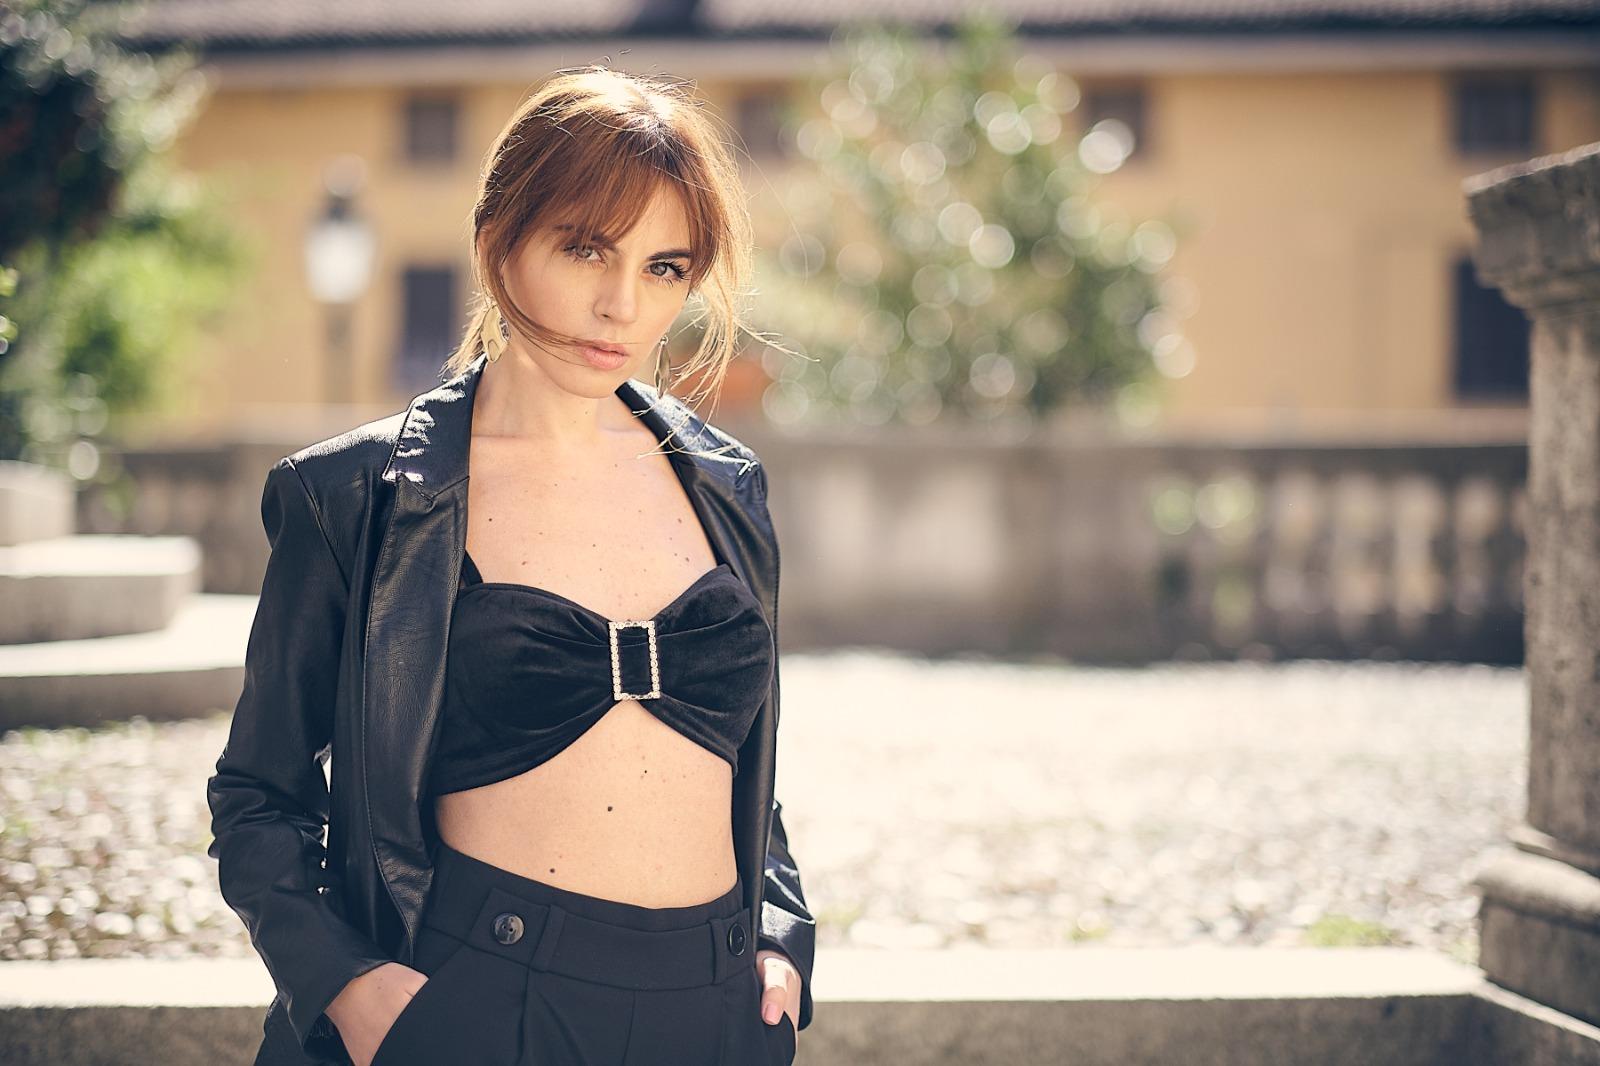 Categorie: Fashion, Glamour, Portrait - Photographer: MASSIMO TAMIAZZO - Model: MIMI - Location: Novi Ligure, AL, Italia